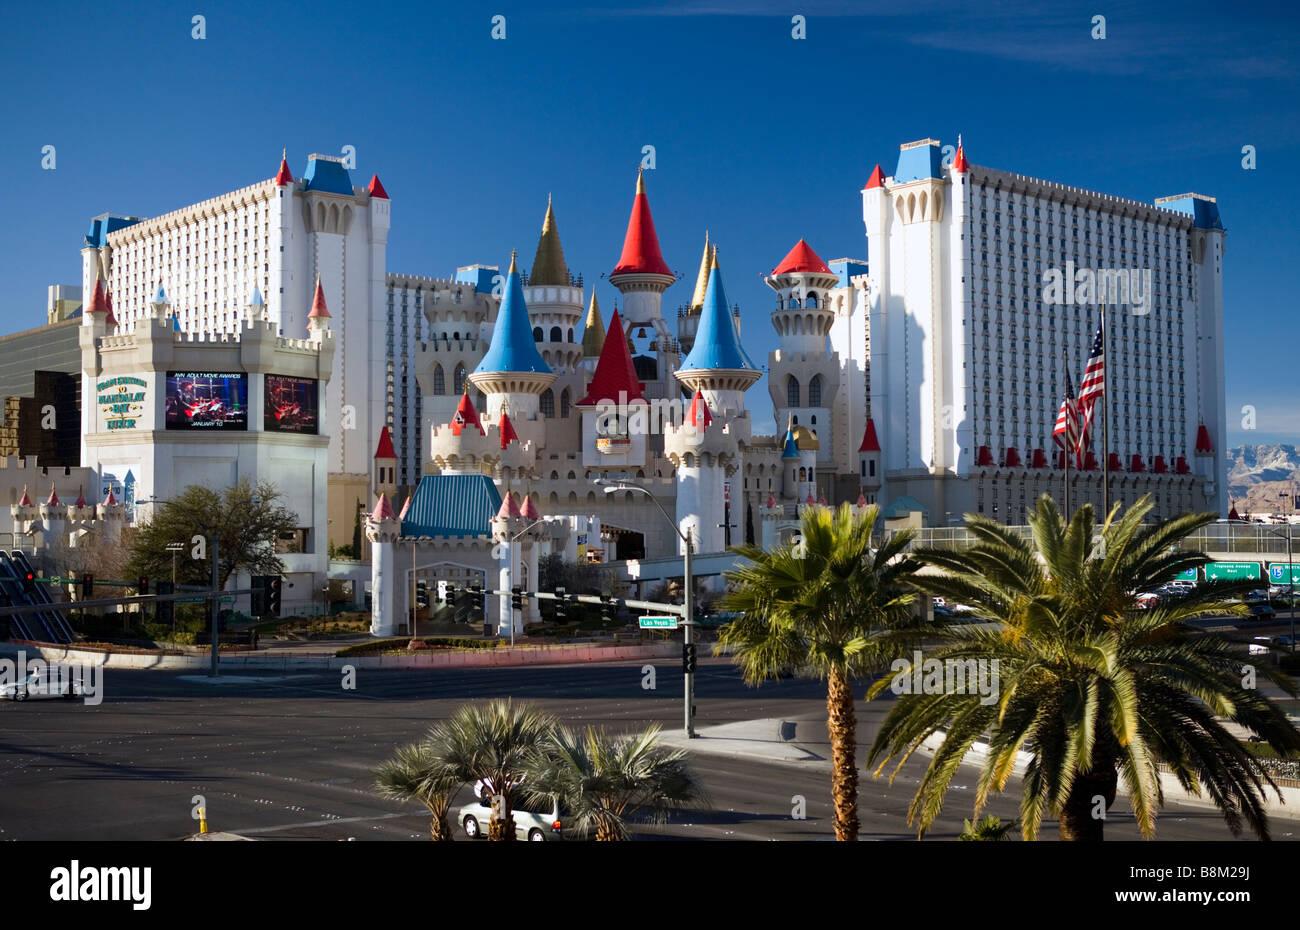 m hotel and casino las vegas nevada